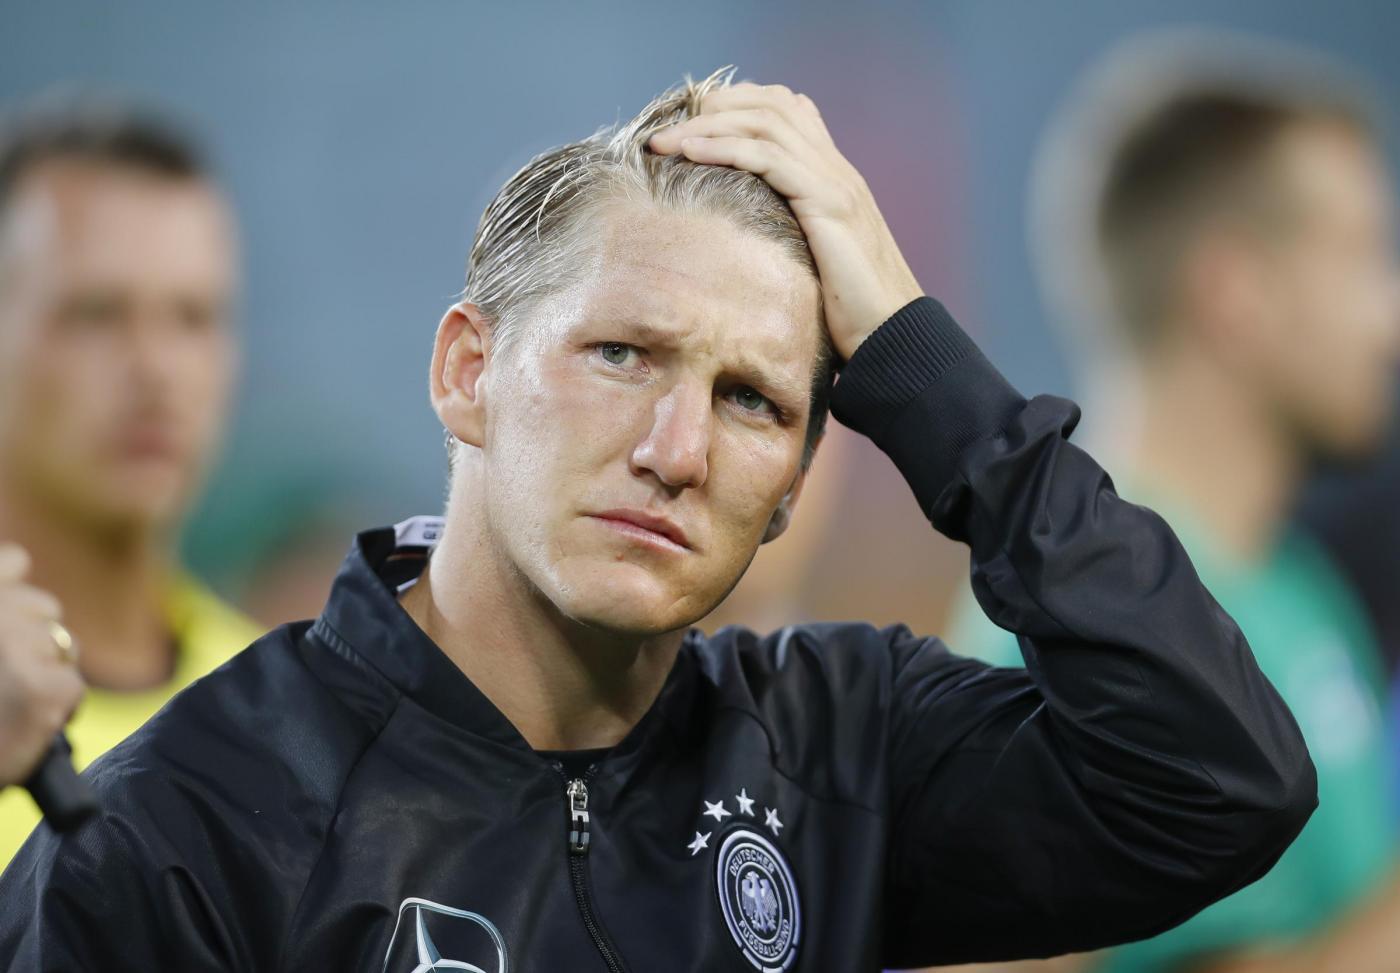 La MLS aspetta Schweinsteiger: il Manchester United lo libera